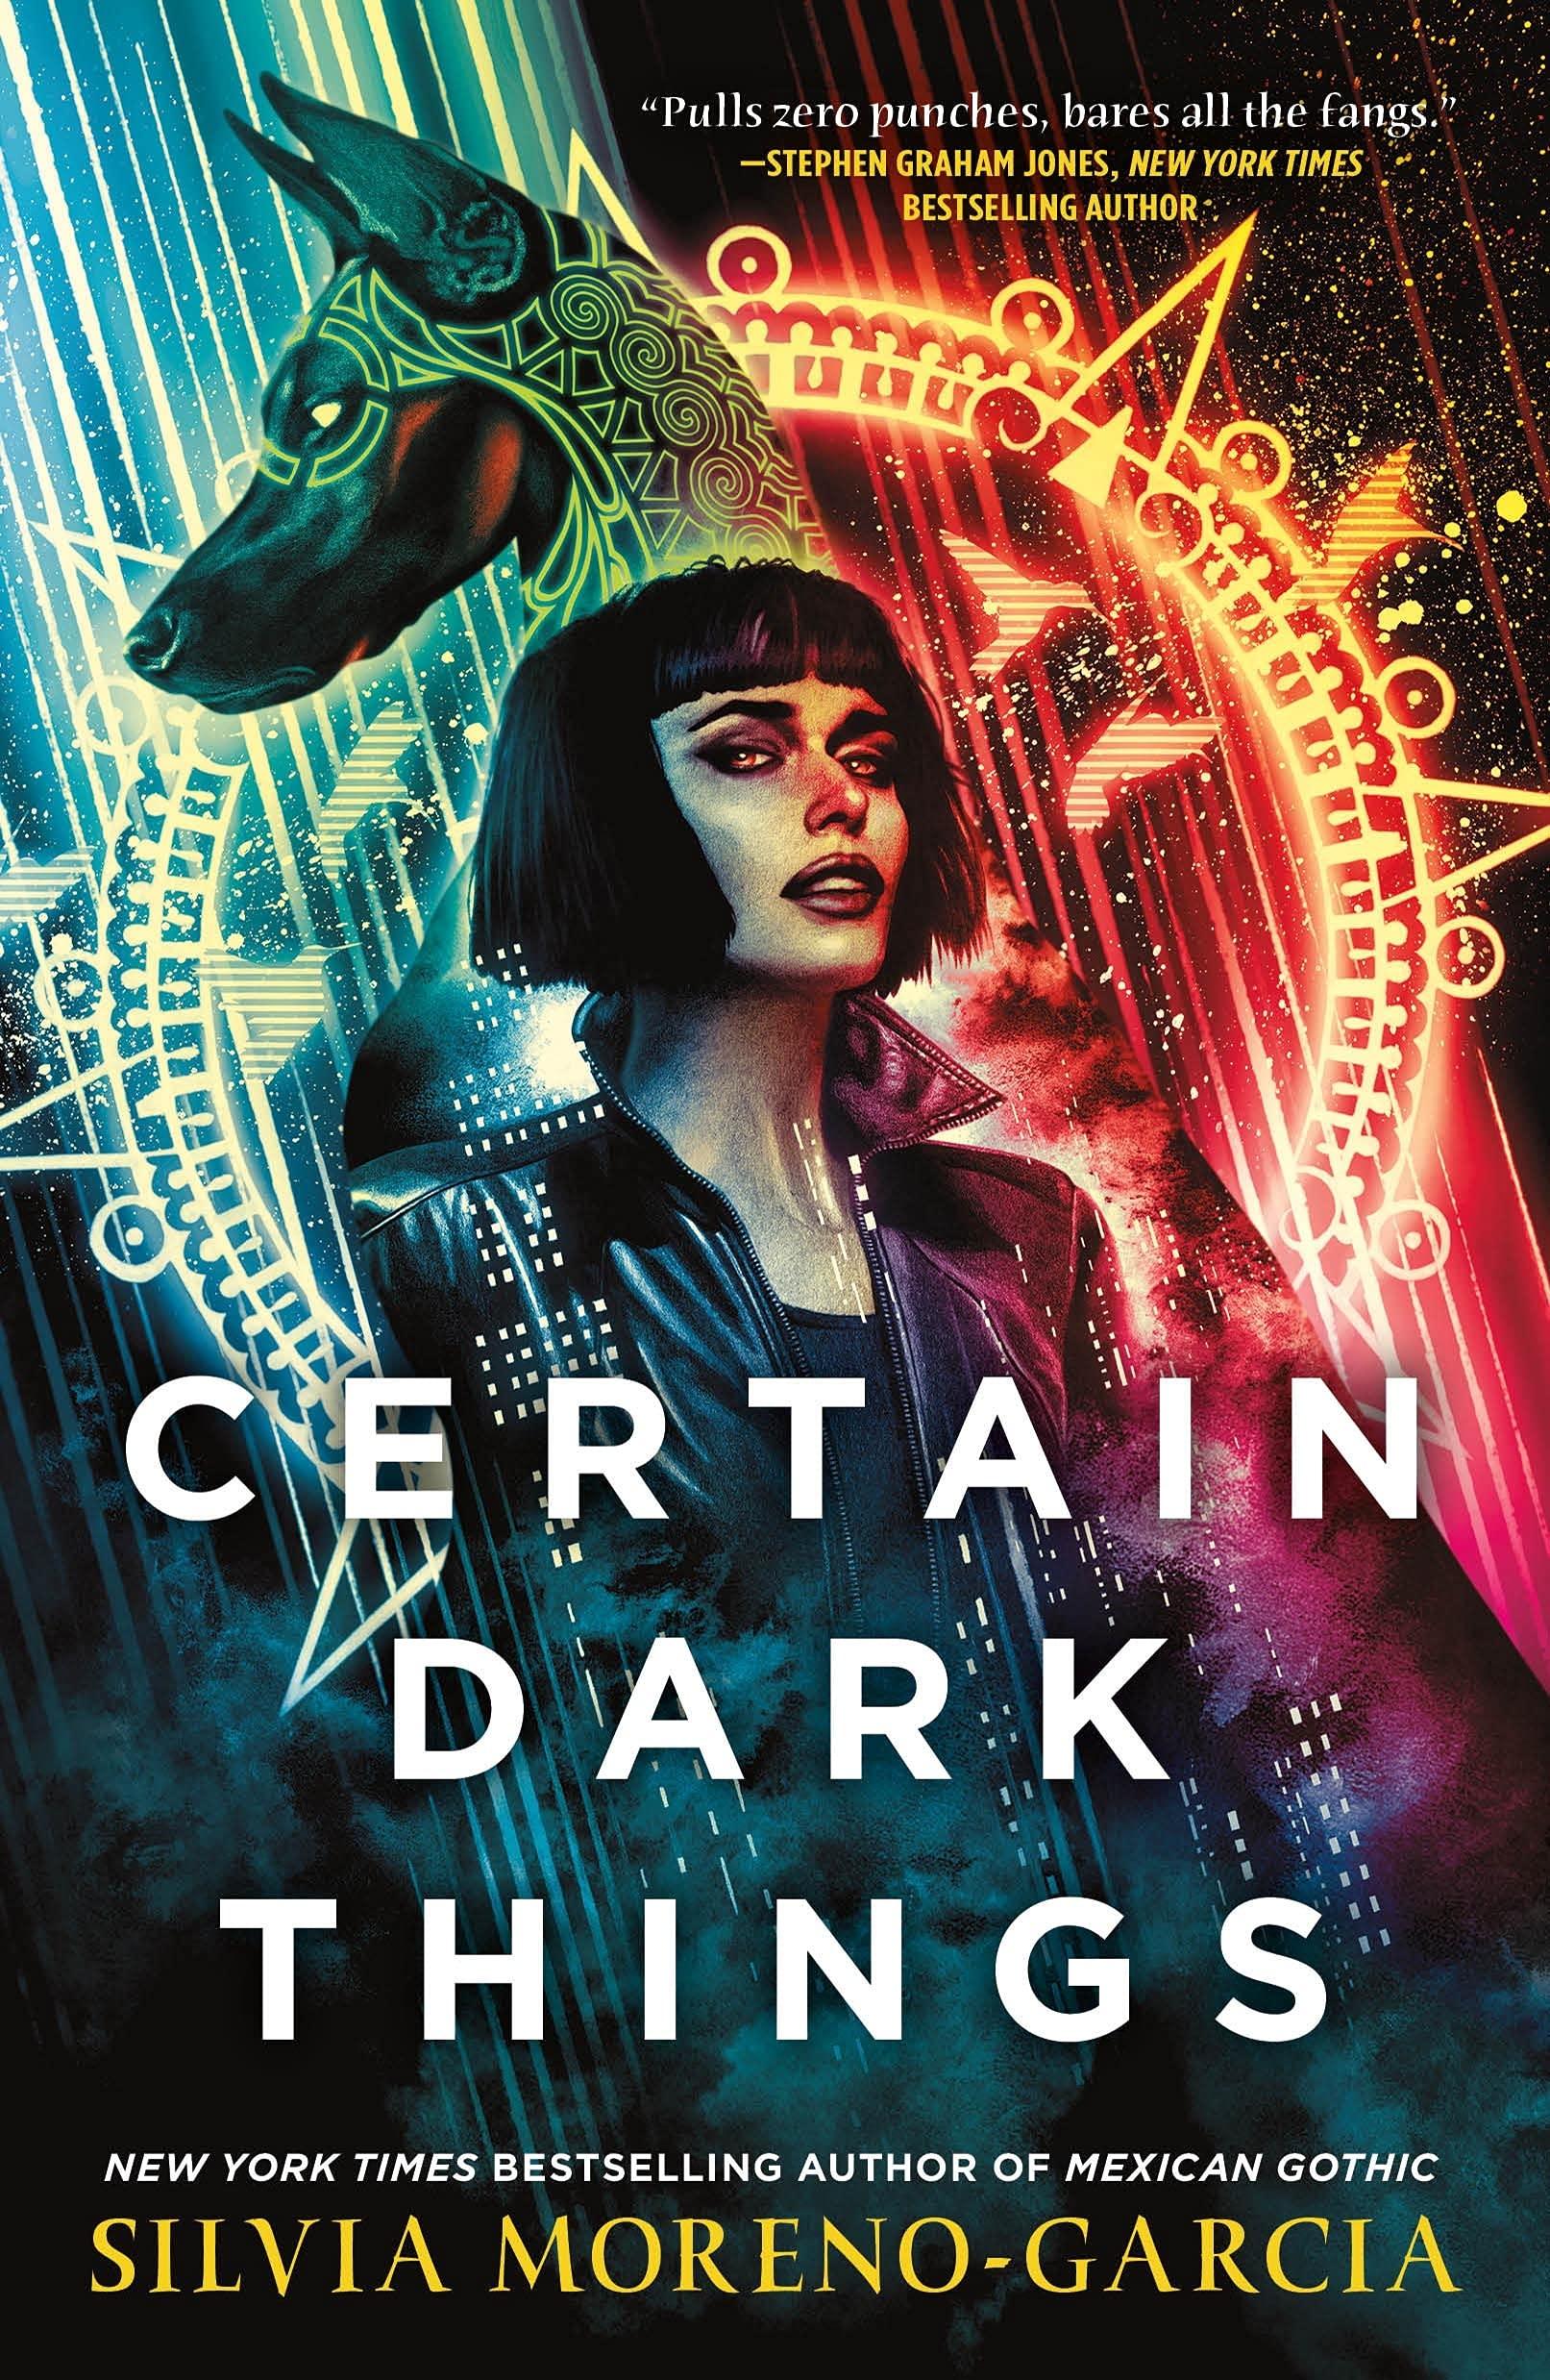 Certain Dark Things: A Novel: Moreno-Garcia, Silvia: 9781250785589:  Amazon.com: Books